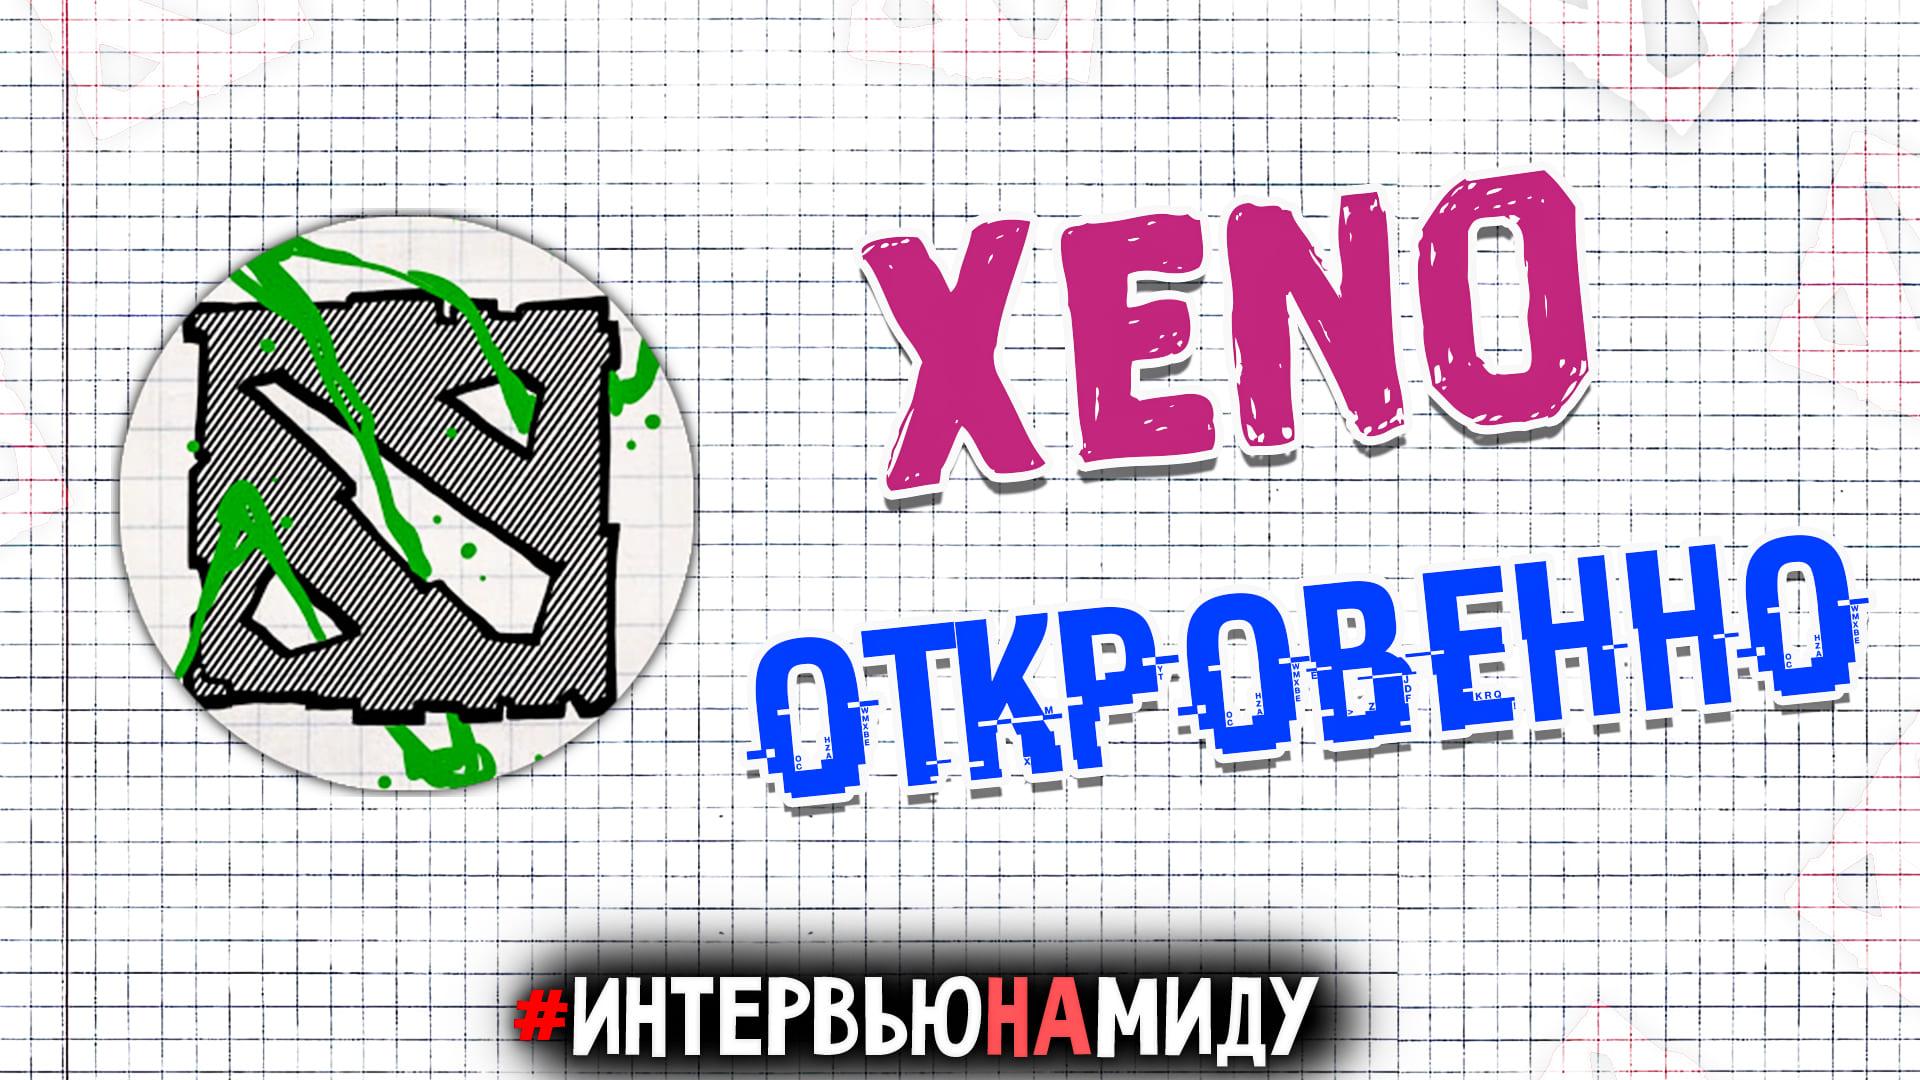 Михаил «Olsior» Зверев, YouTube, Интервью, RuHub, Maincast, The International, Ярослав «NS» Кузнецов, интервью